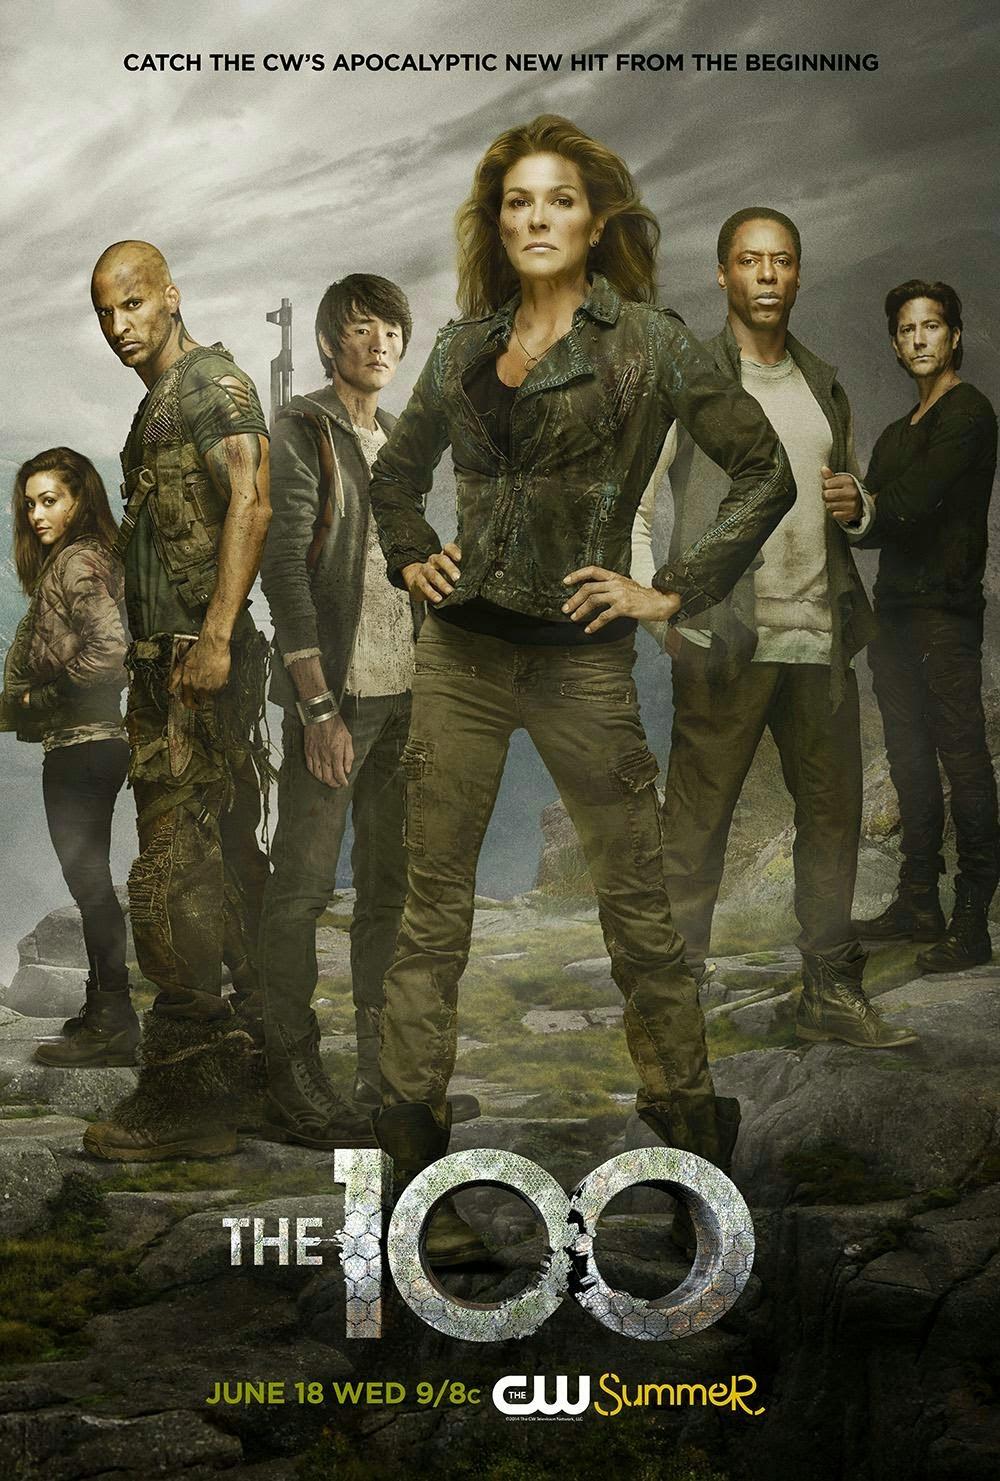 100 Tù Binh Phần 1 - The 100 Season 1 - 2014